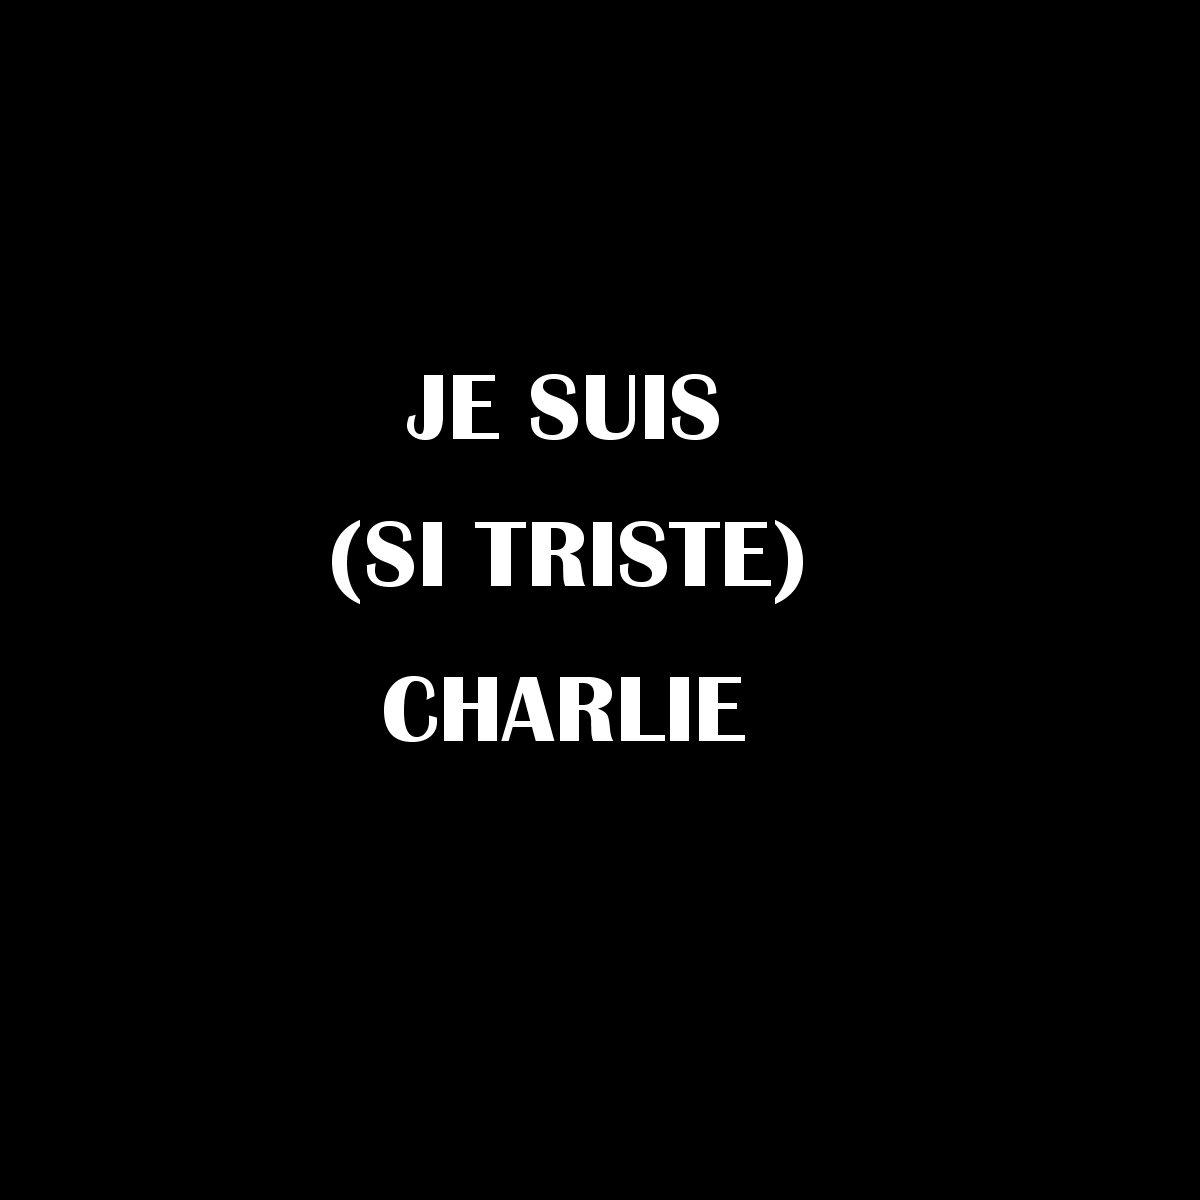 Je suis (si triste) Charlie